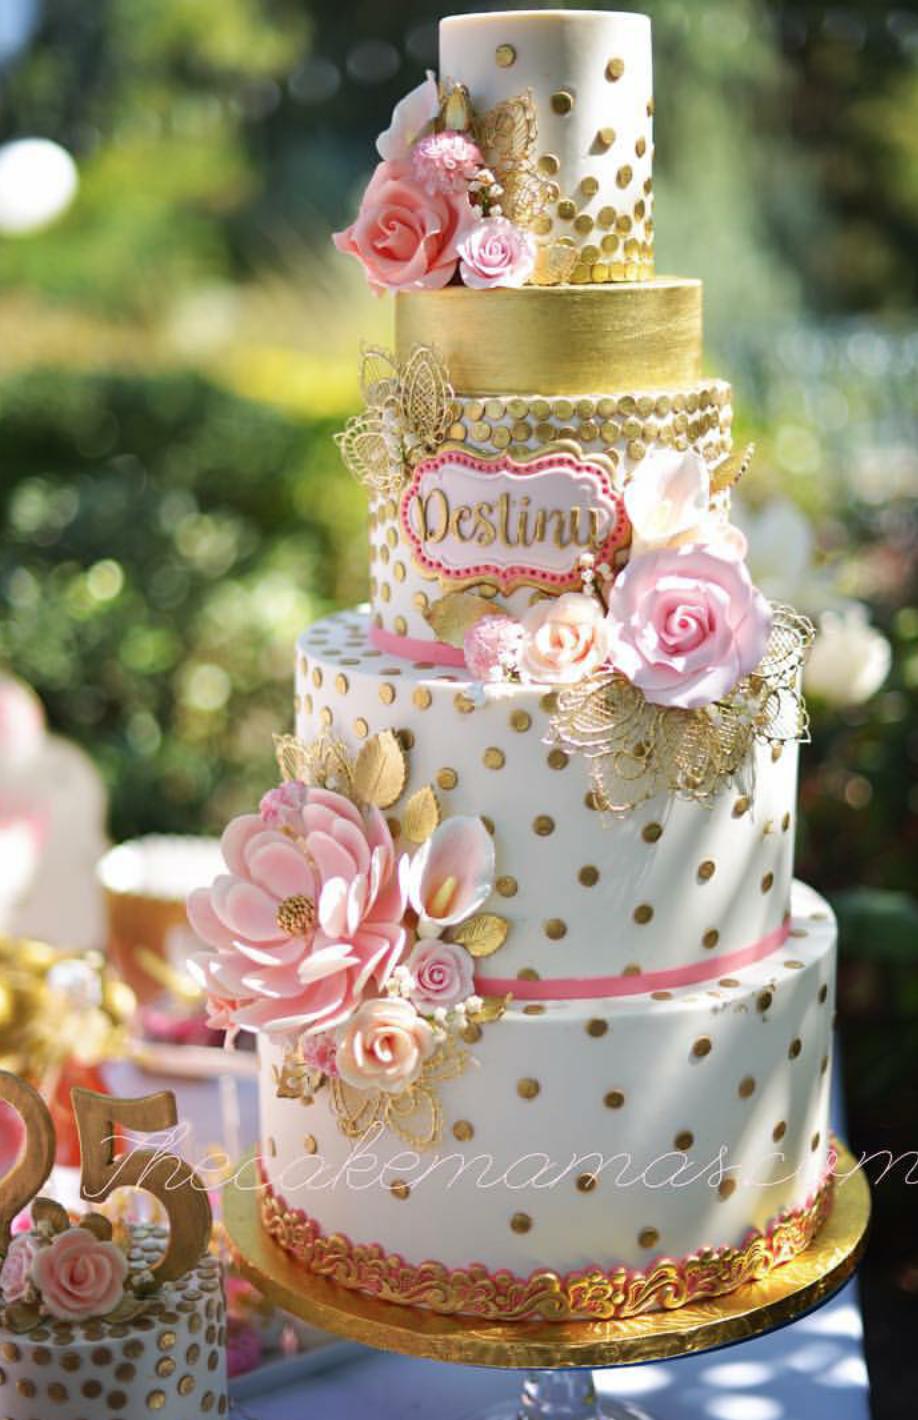 Gold and white polka dot wedding